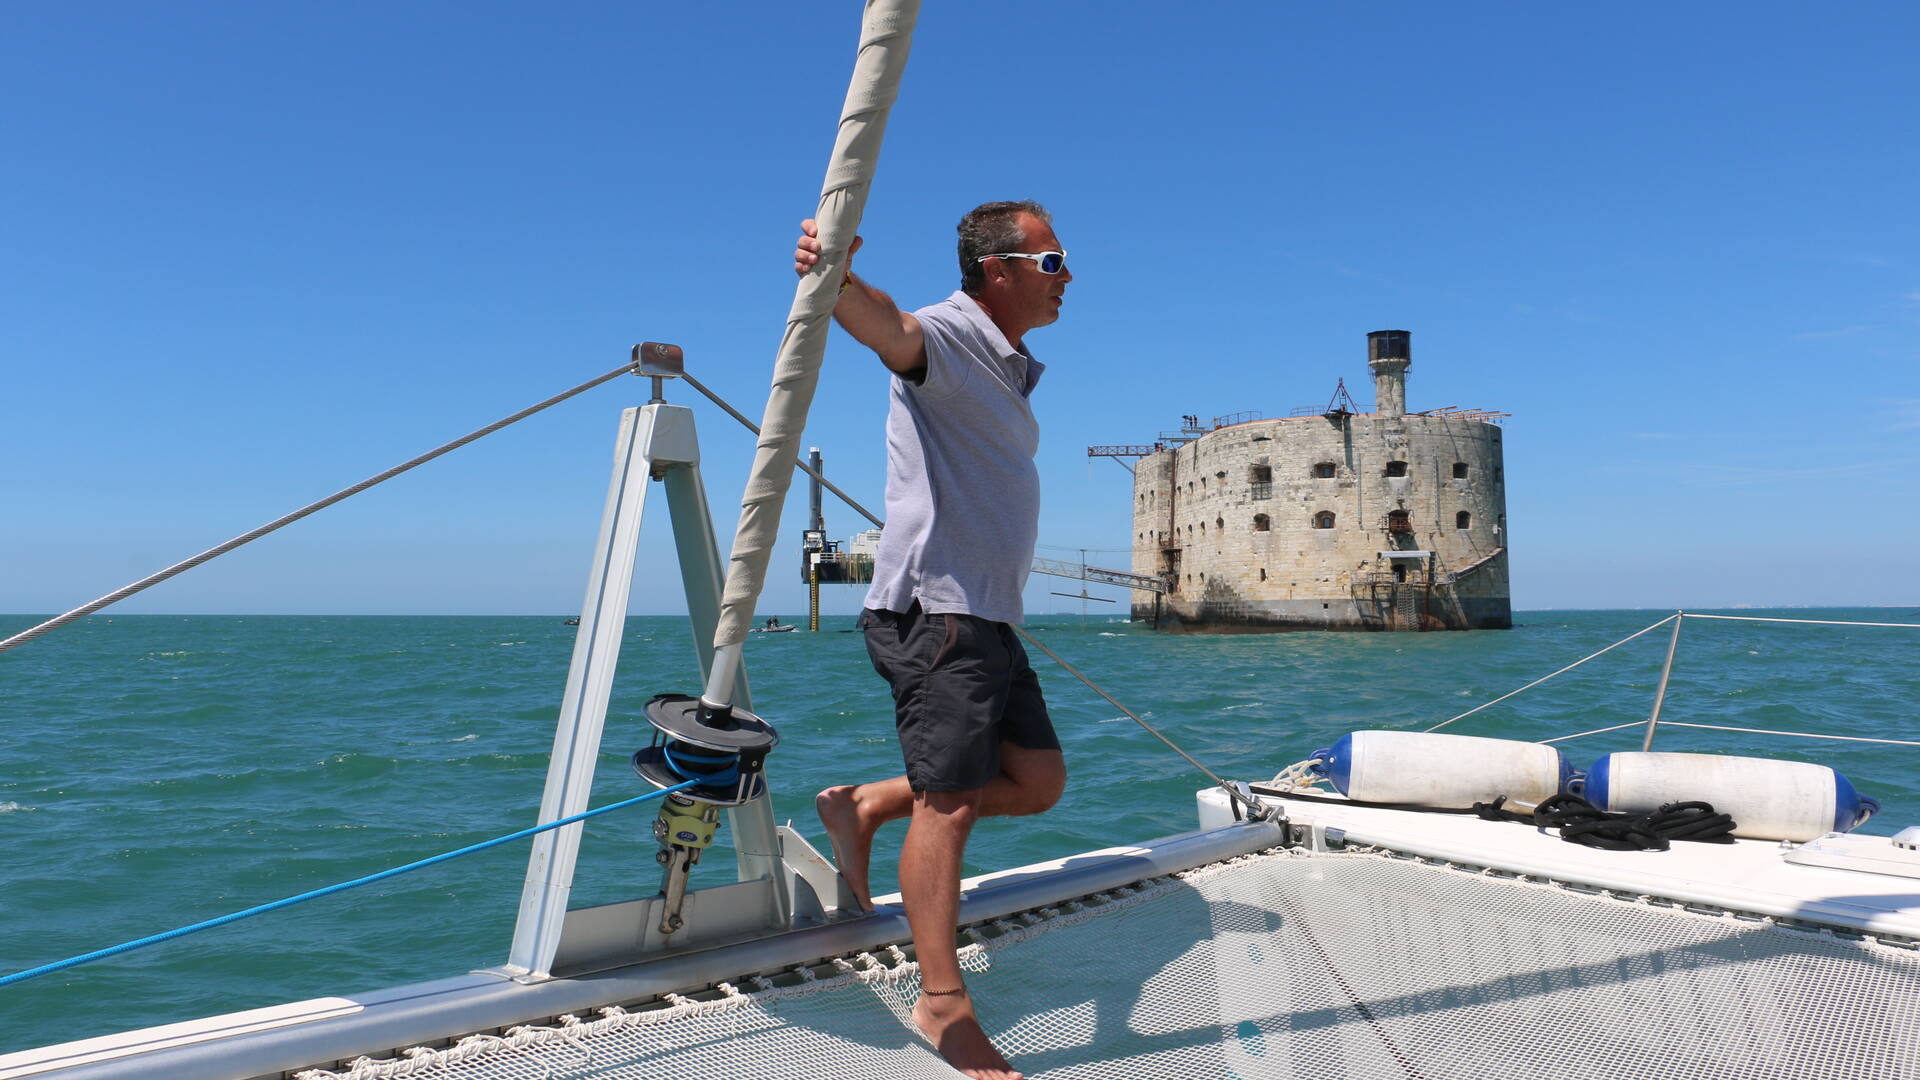 Cap sur le célèbre fort Boyard à bord du catamaran Vertige